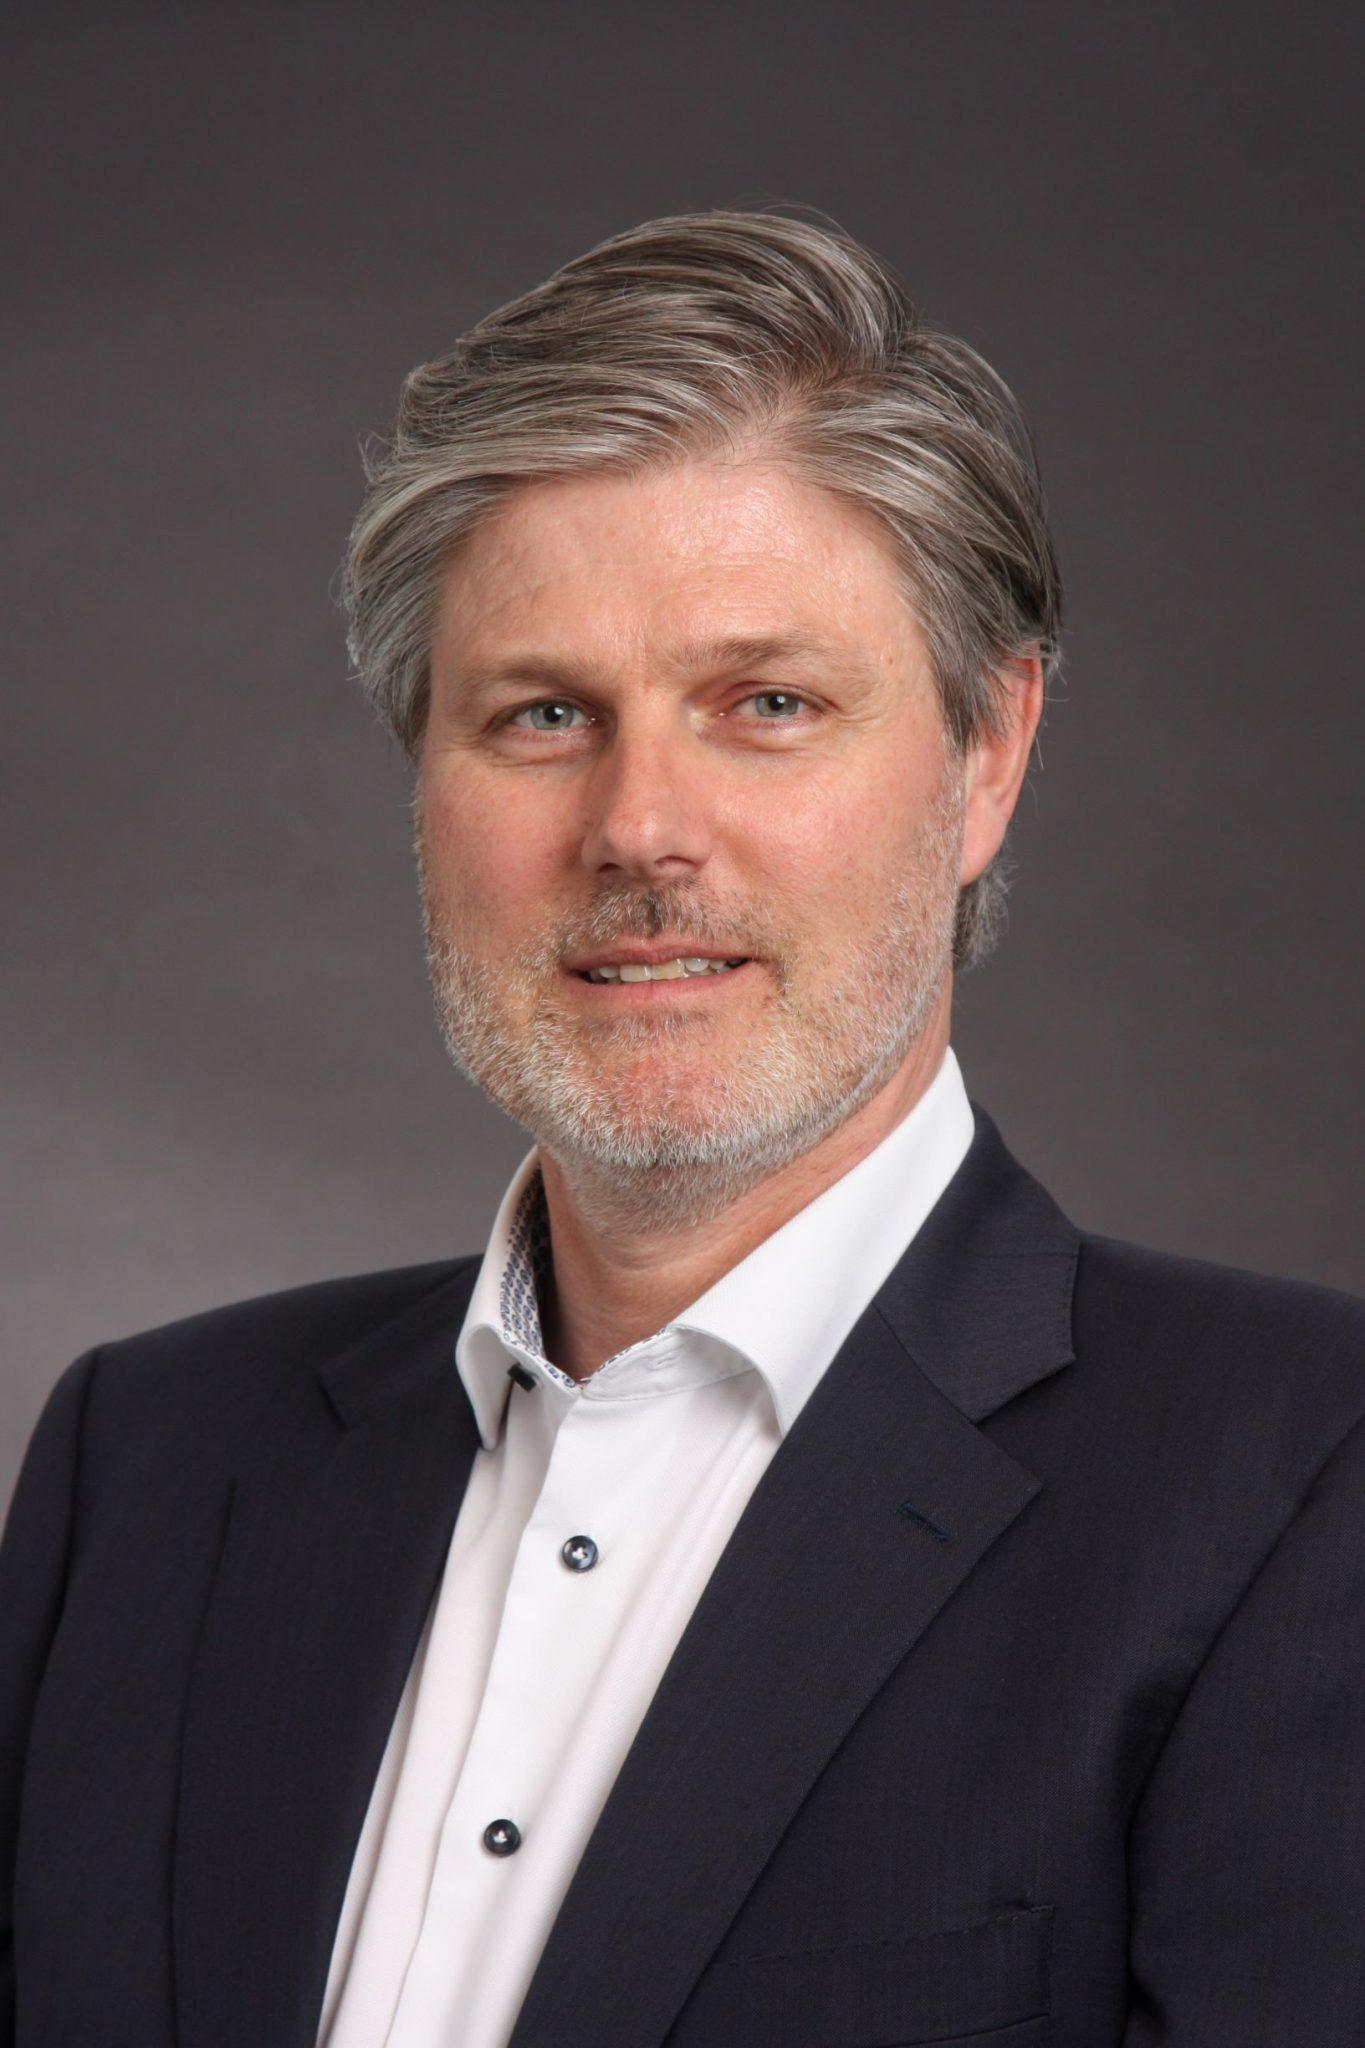 Roger van Stuyvenberg